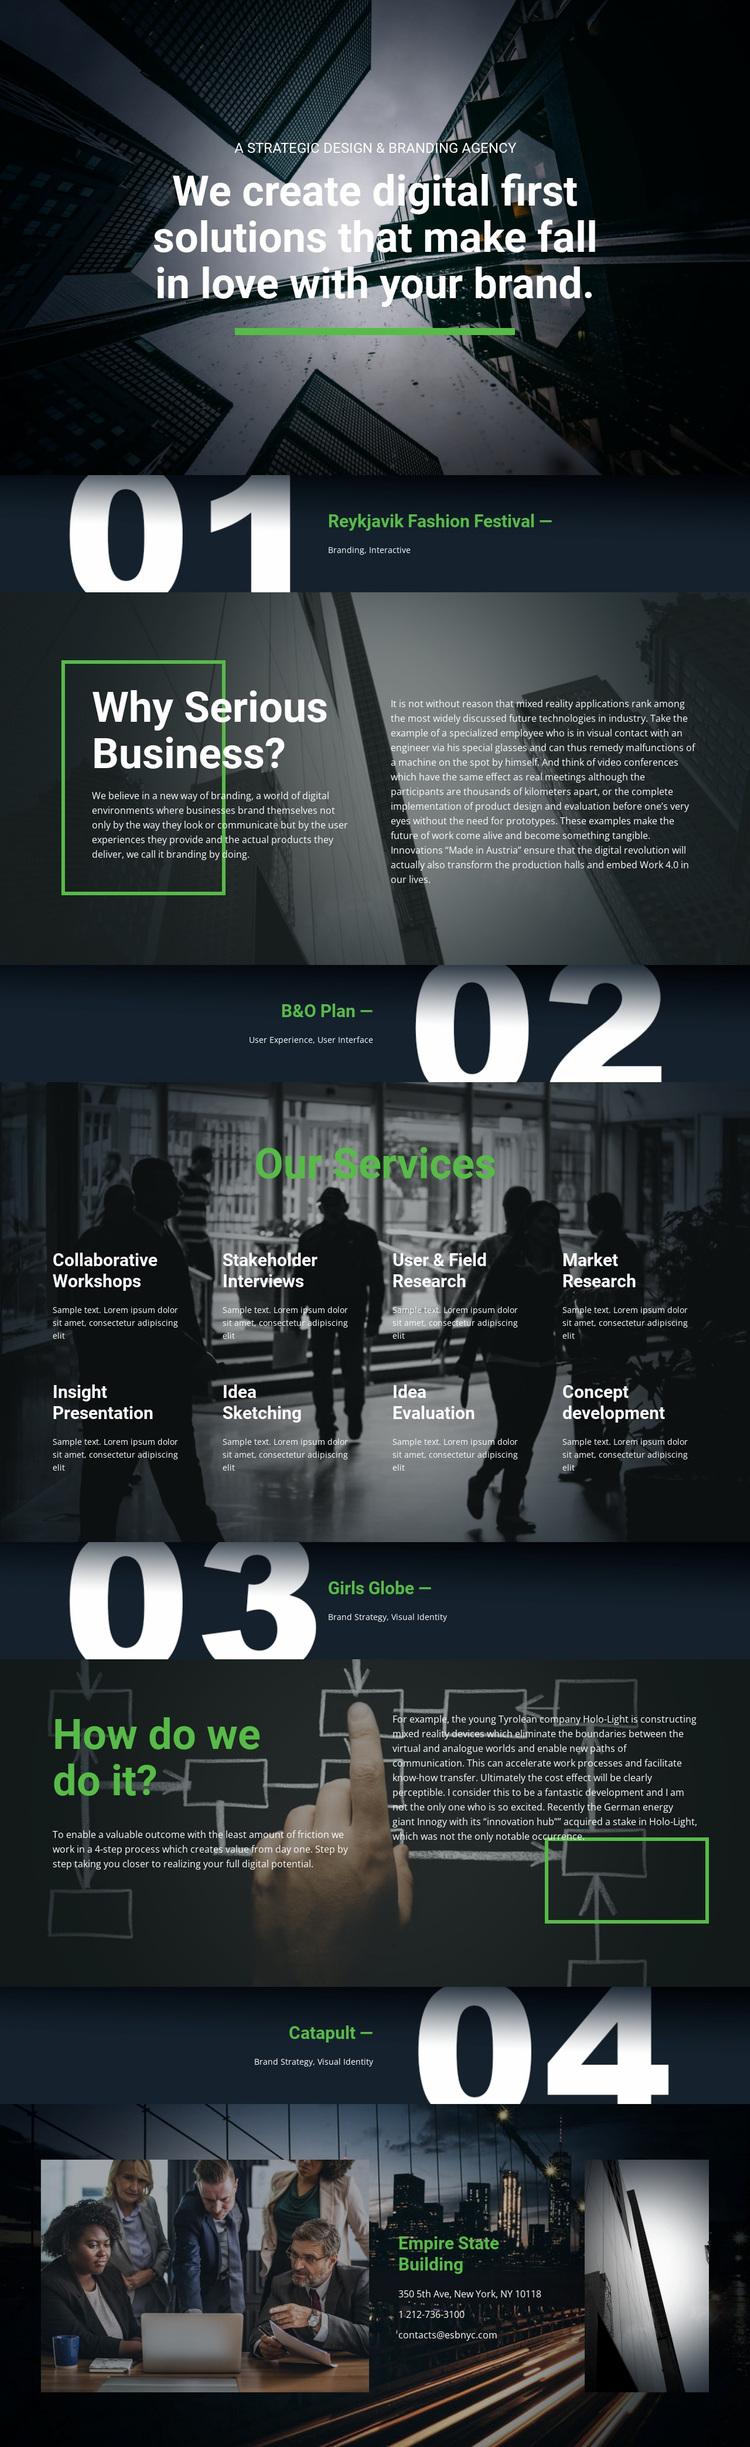 Digital first solutions Website Design